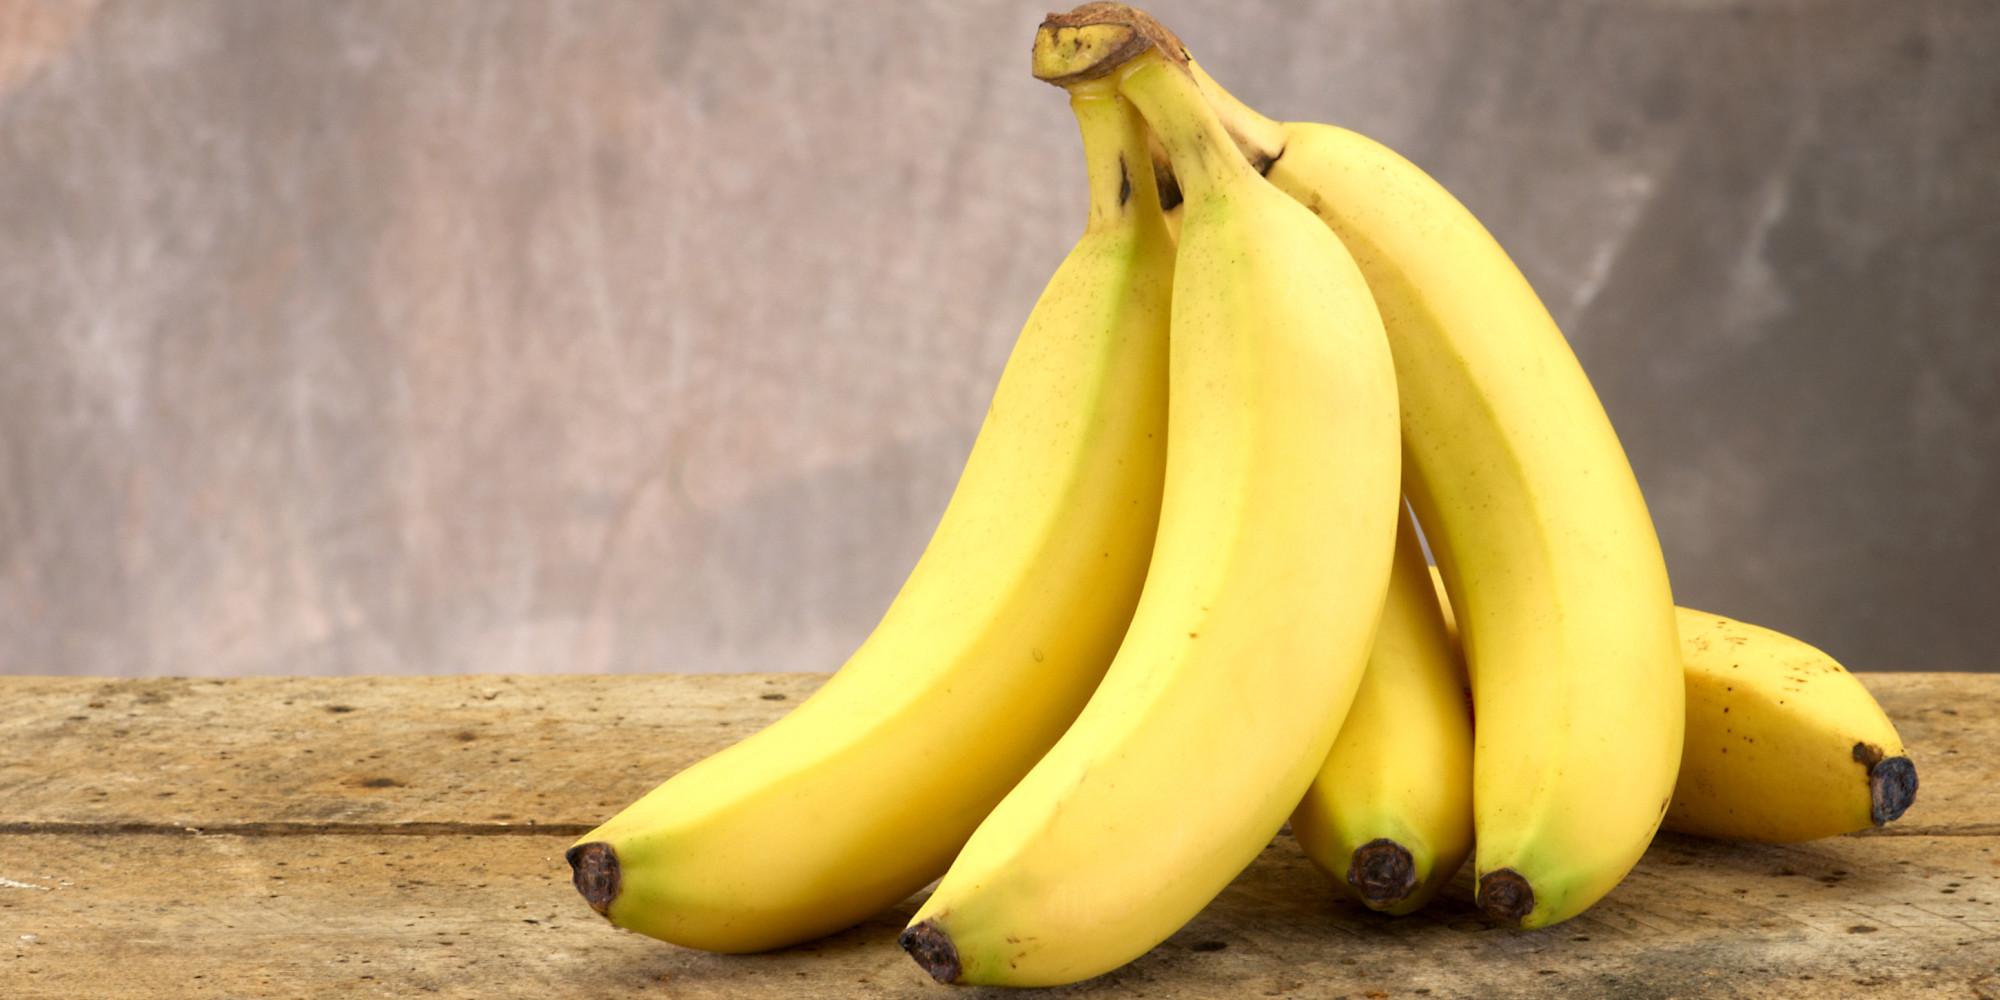 yellow banana lot free image | Peakpx